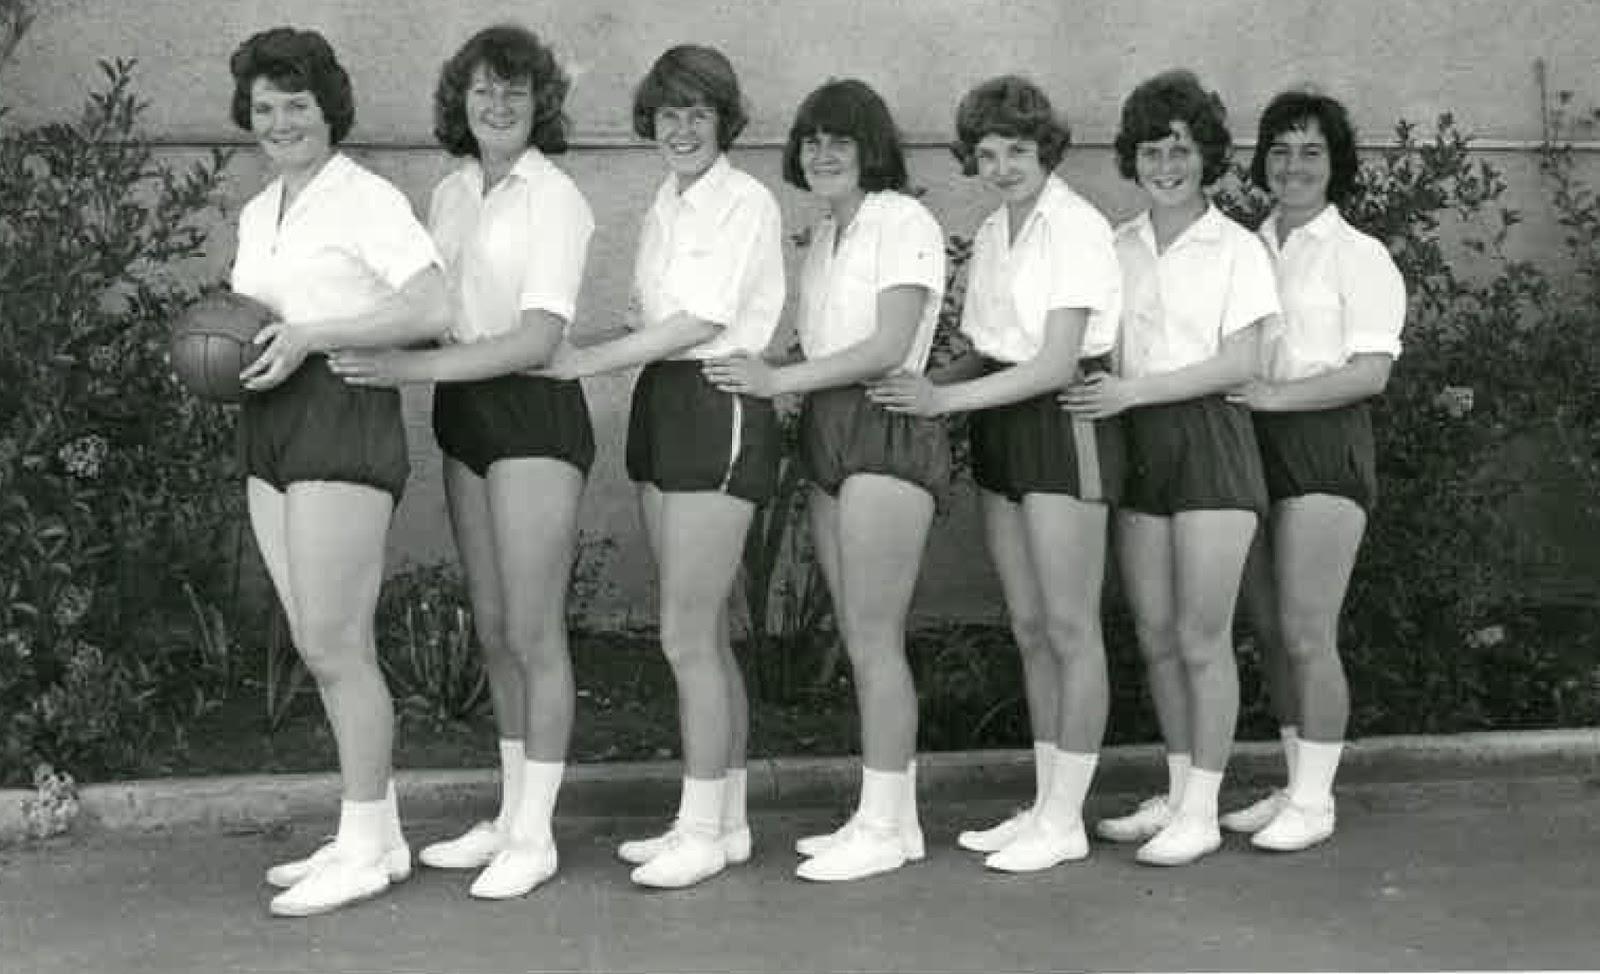 Lilydale High School class of 65